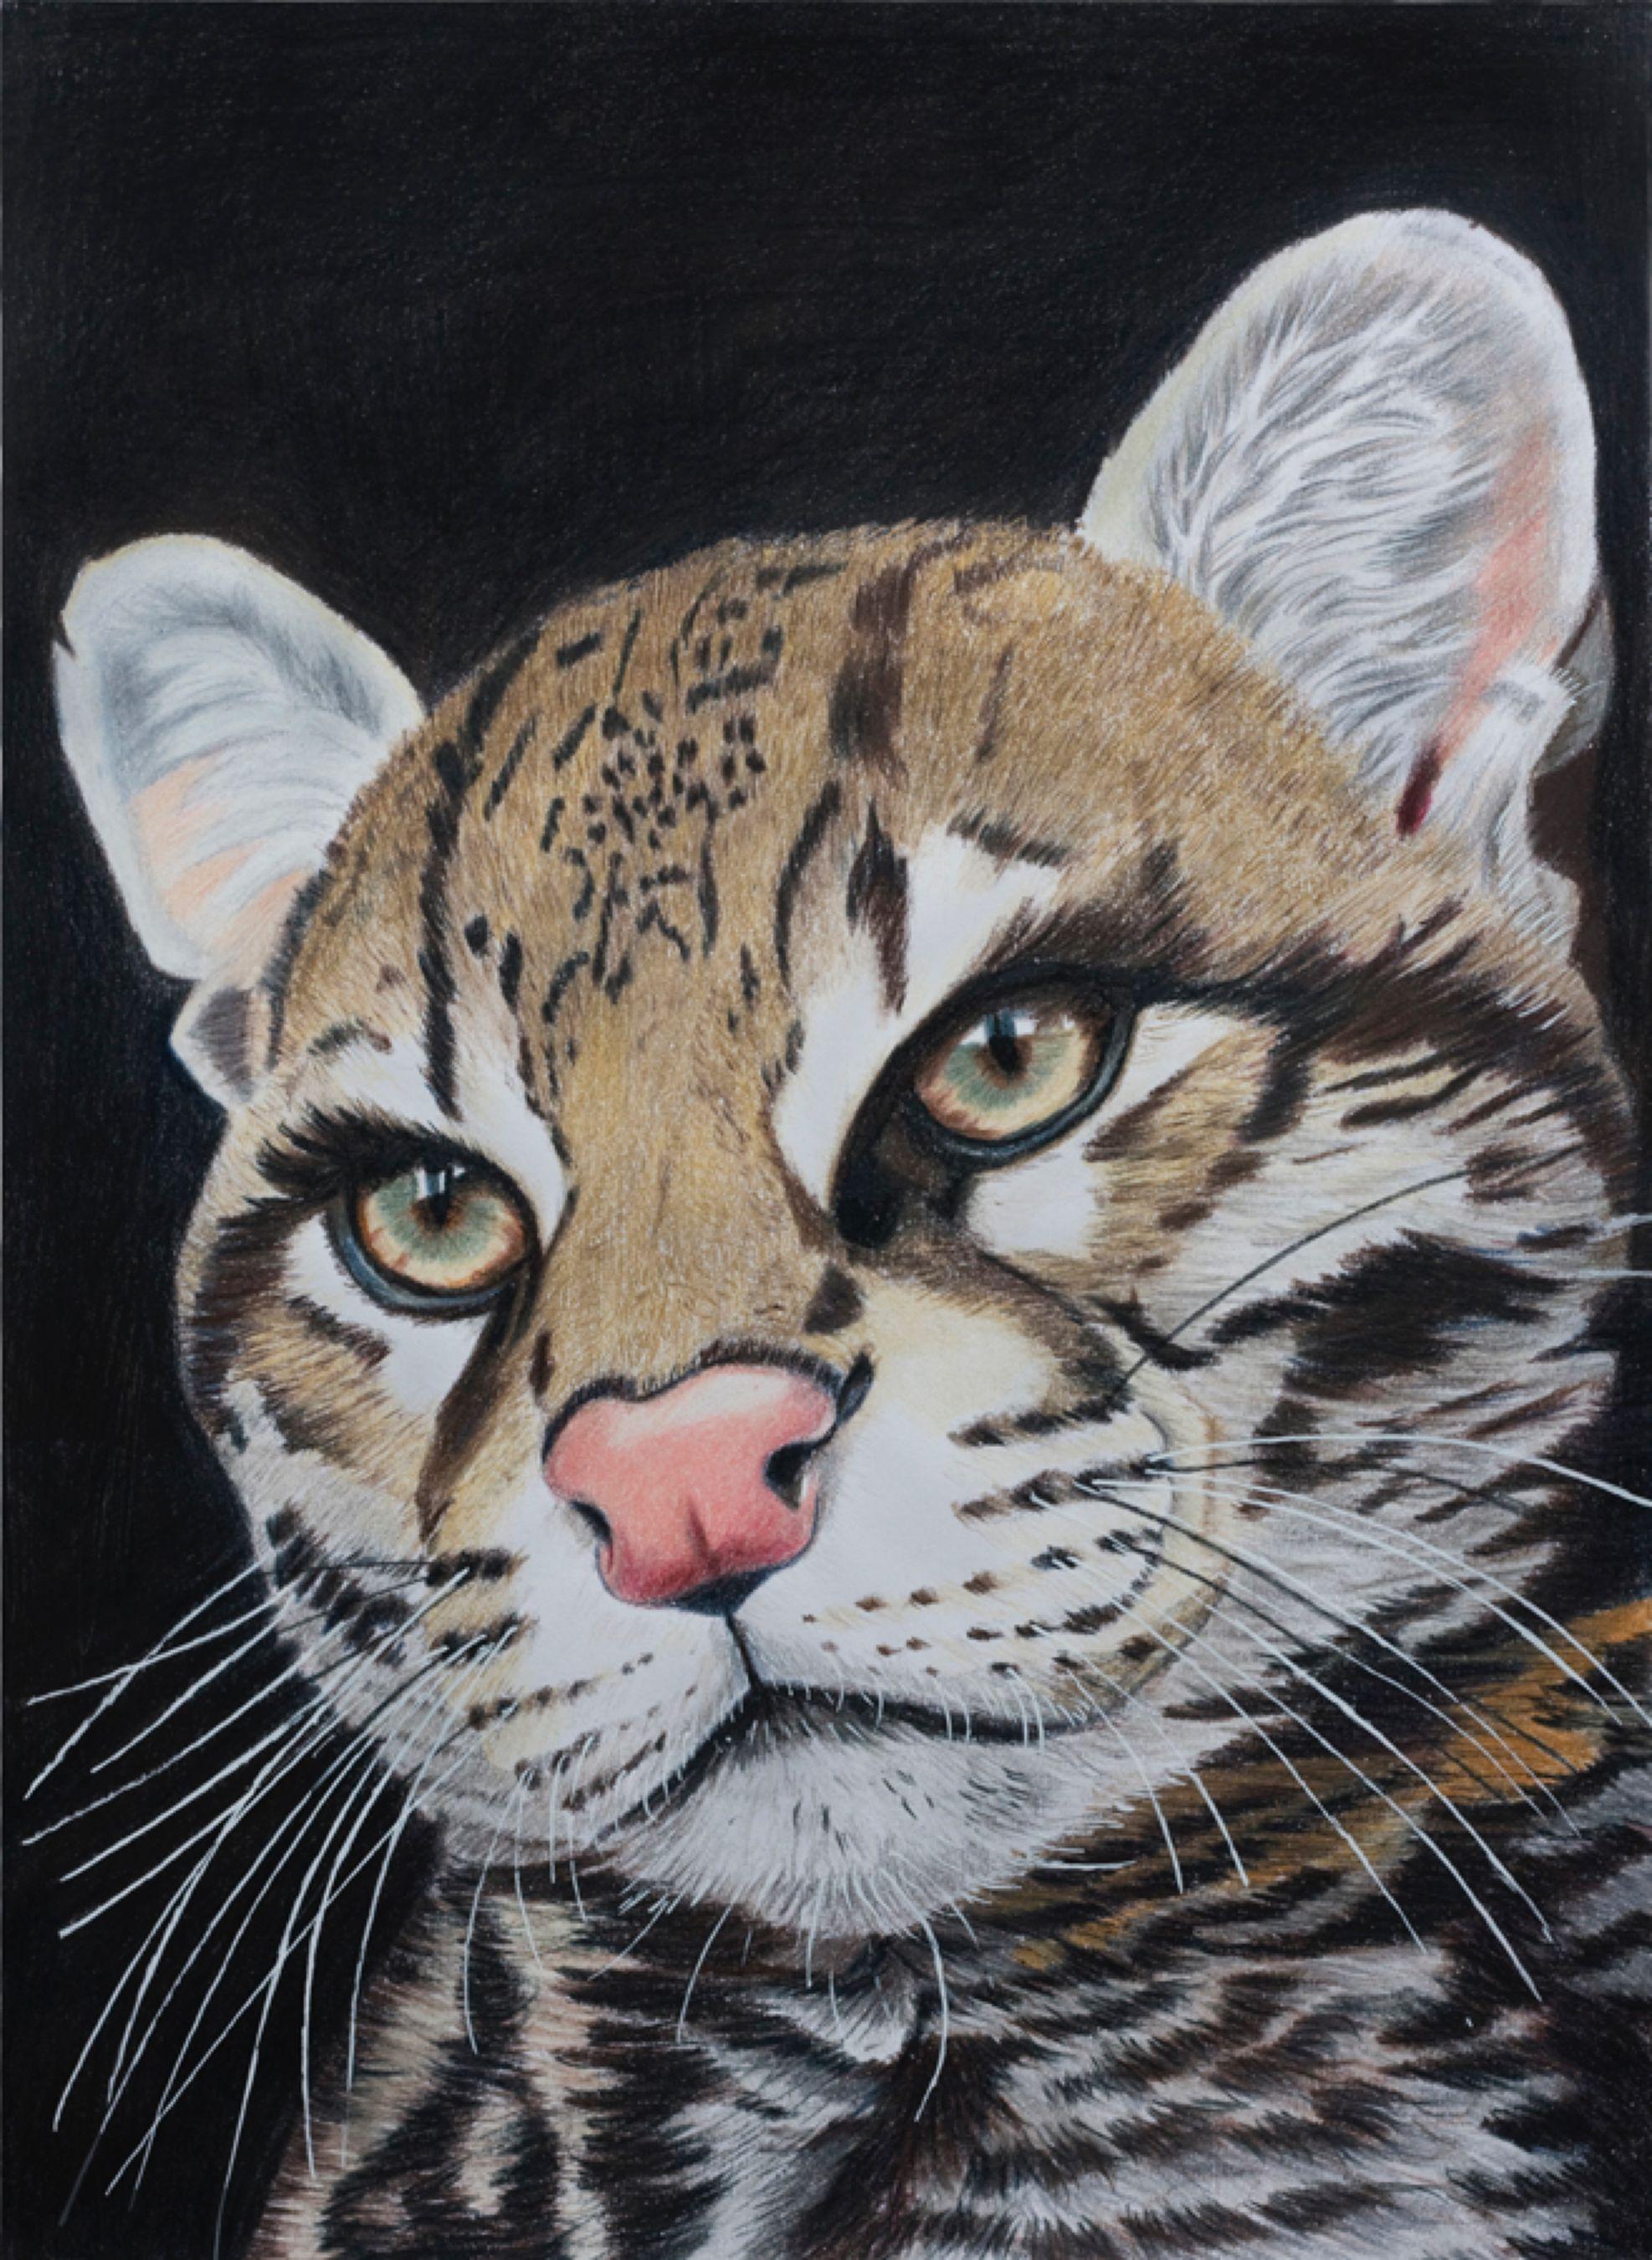 Billy by Sarahharas07 on DeviantArt Art, Wildlife art